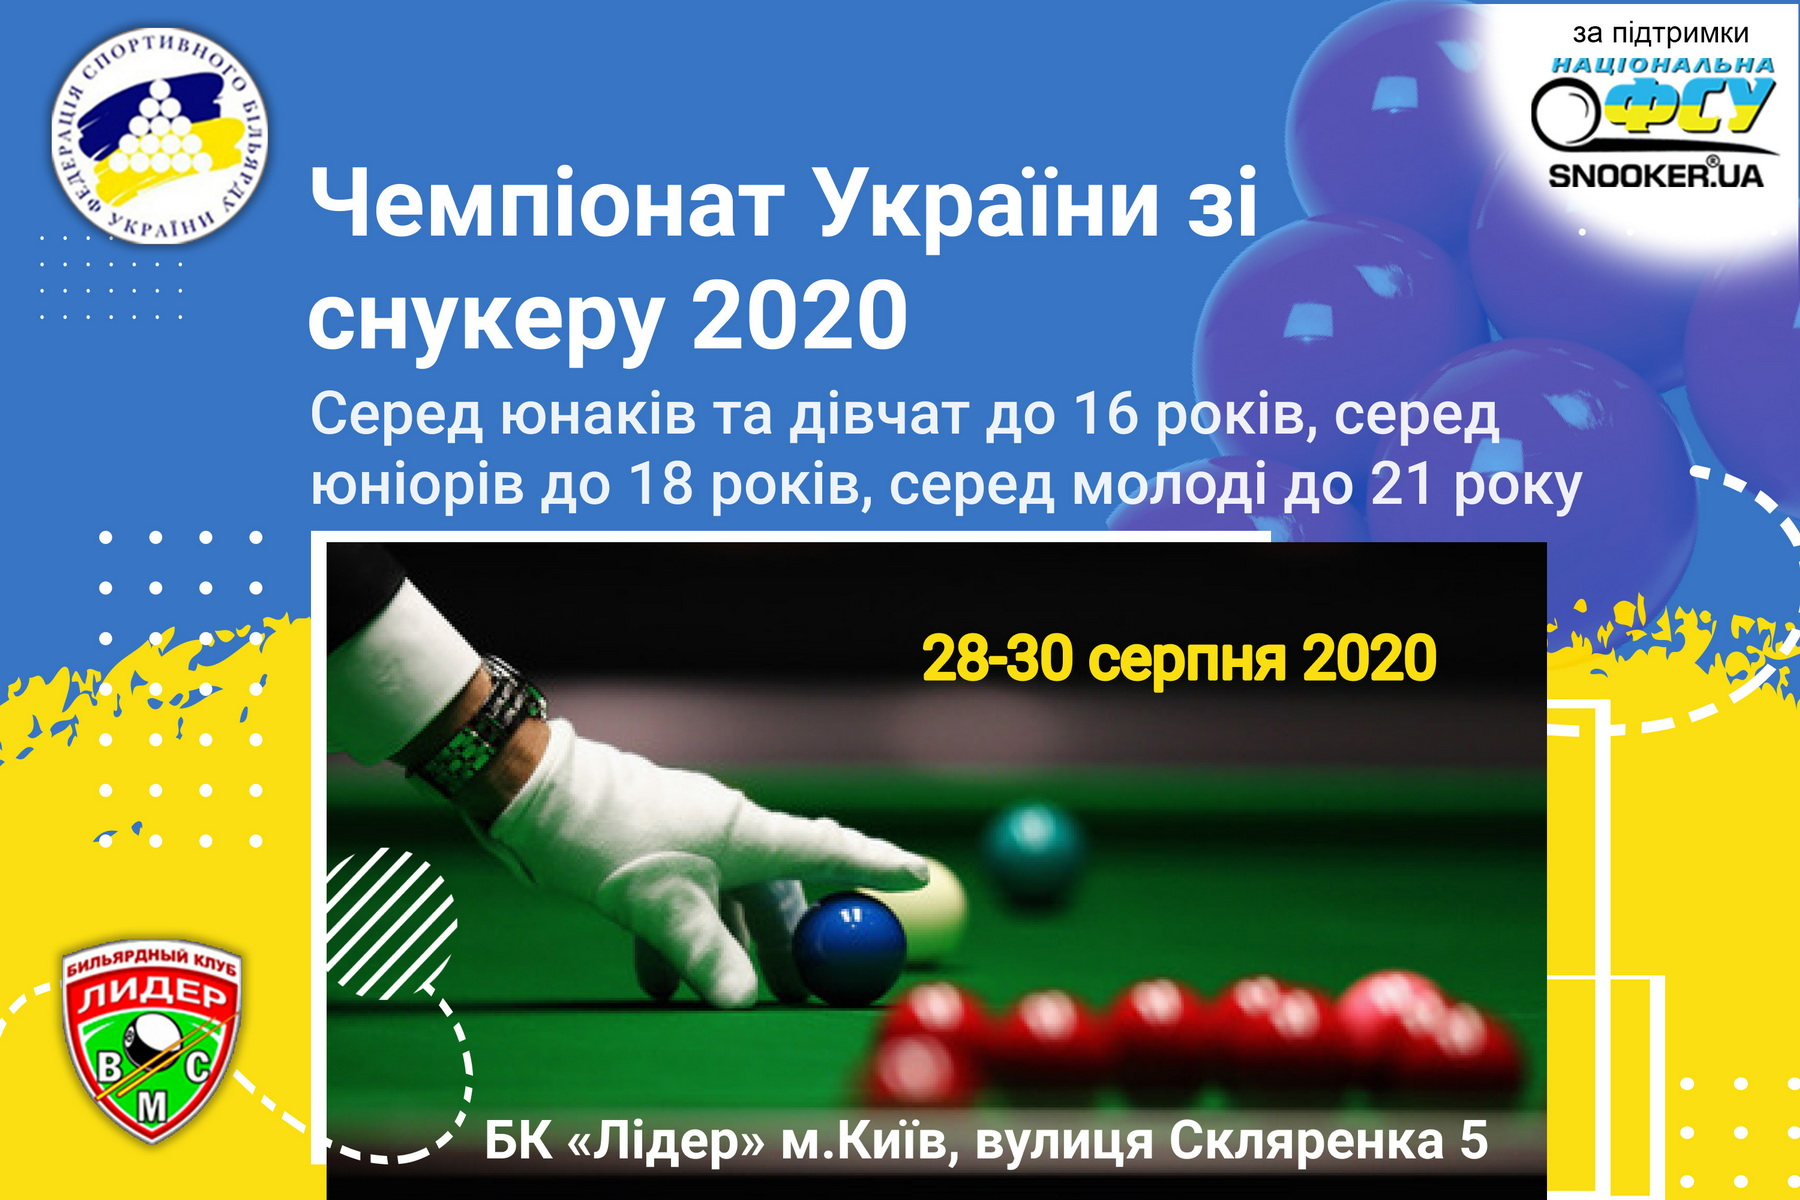 Ukrainian Snooker Championship 2020 U16